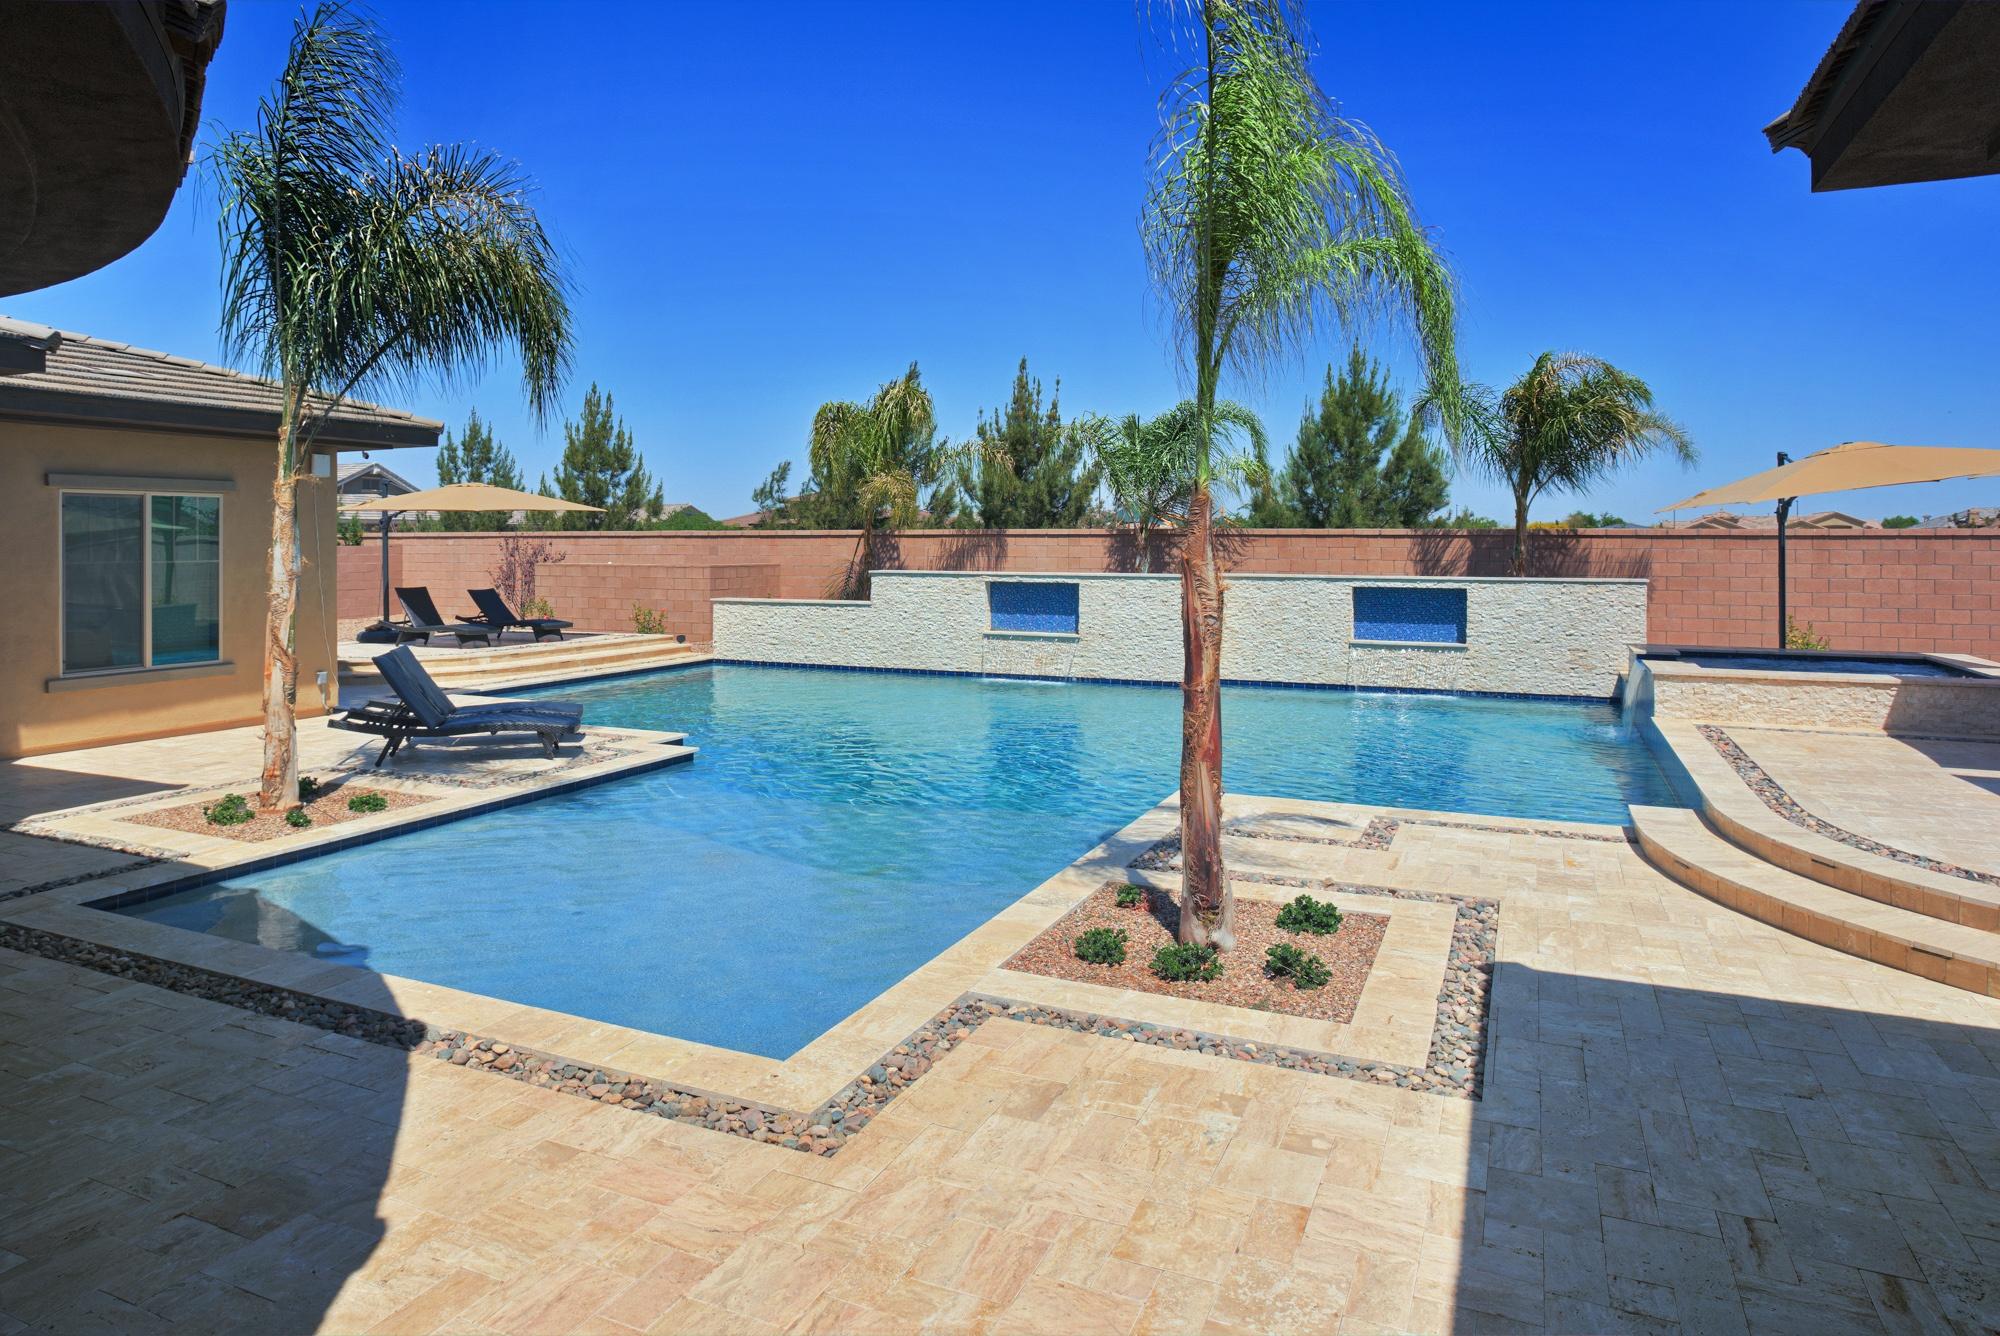 pool design spotlight collaborative geometry